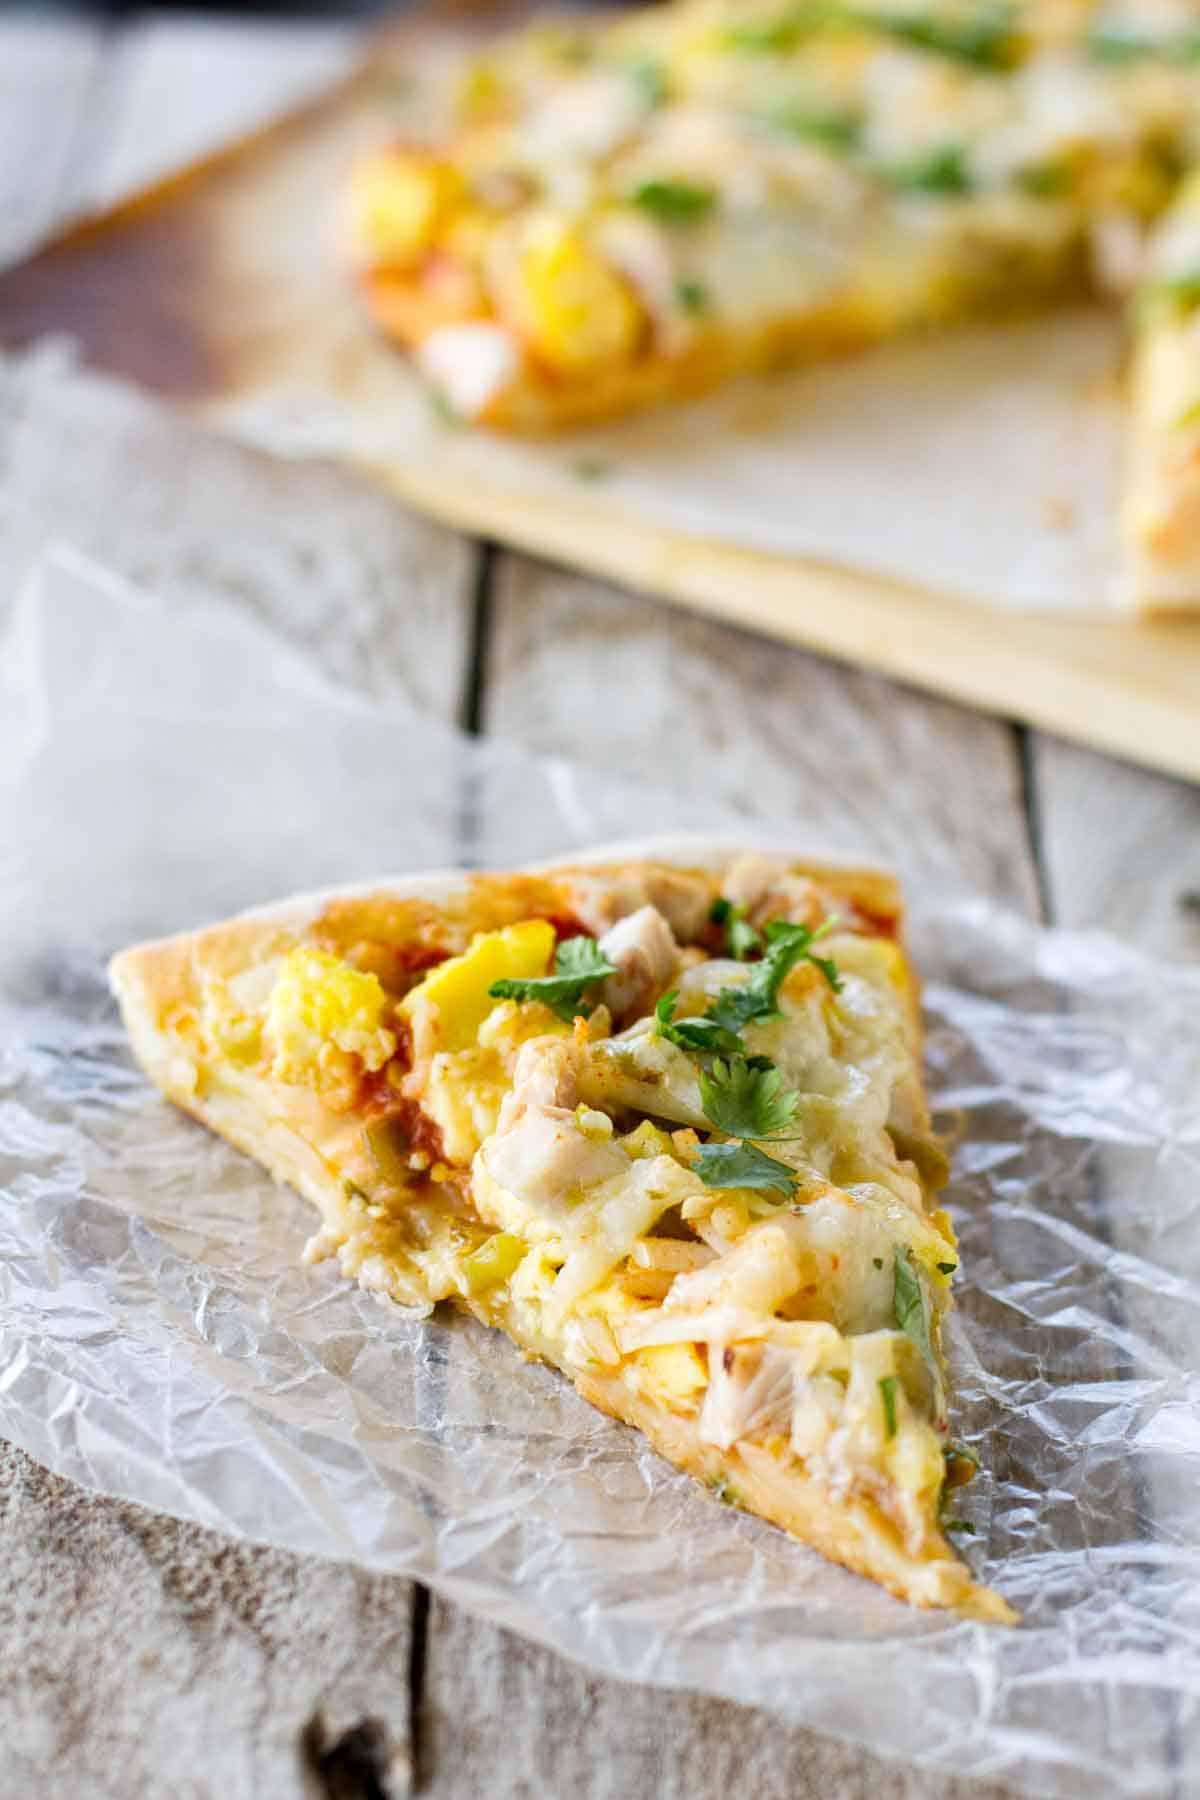 slice of Mexican Turkey Breakfast Pizza